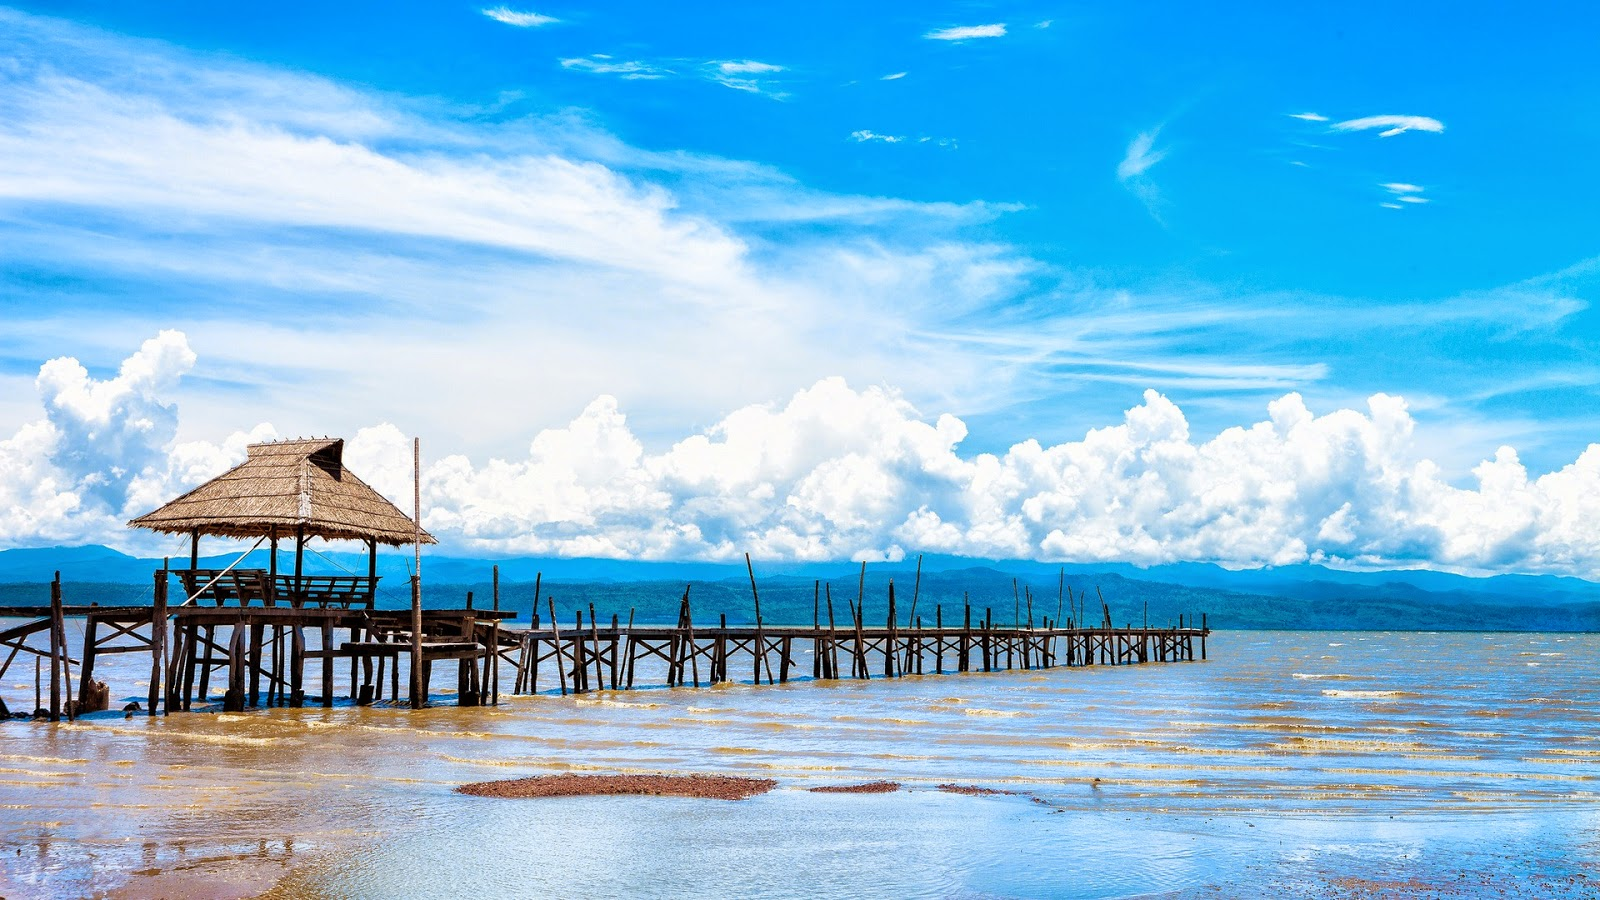 Resort-hut-near-beach-photo-image-wallpaper-for-mac-ipad-tablet.jpg